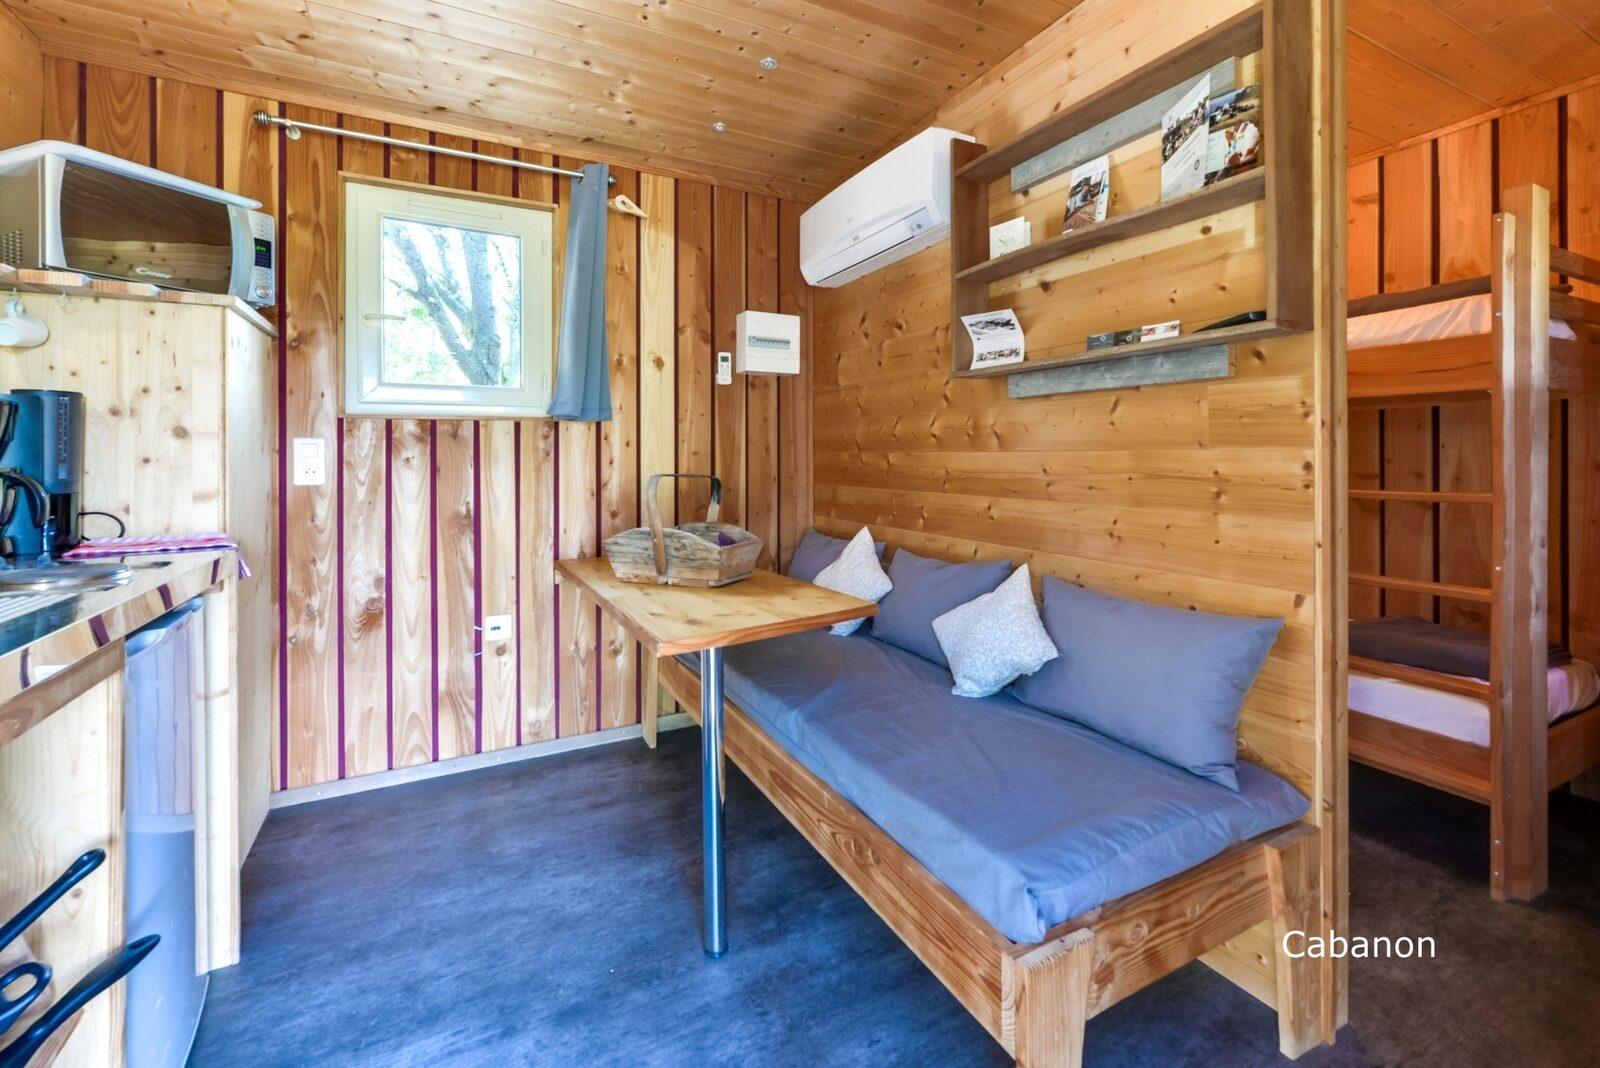 Lodges in de Provence - Cabanon: houten cabin met airco